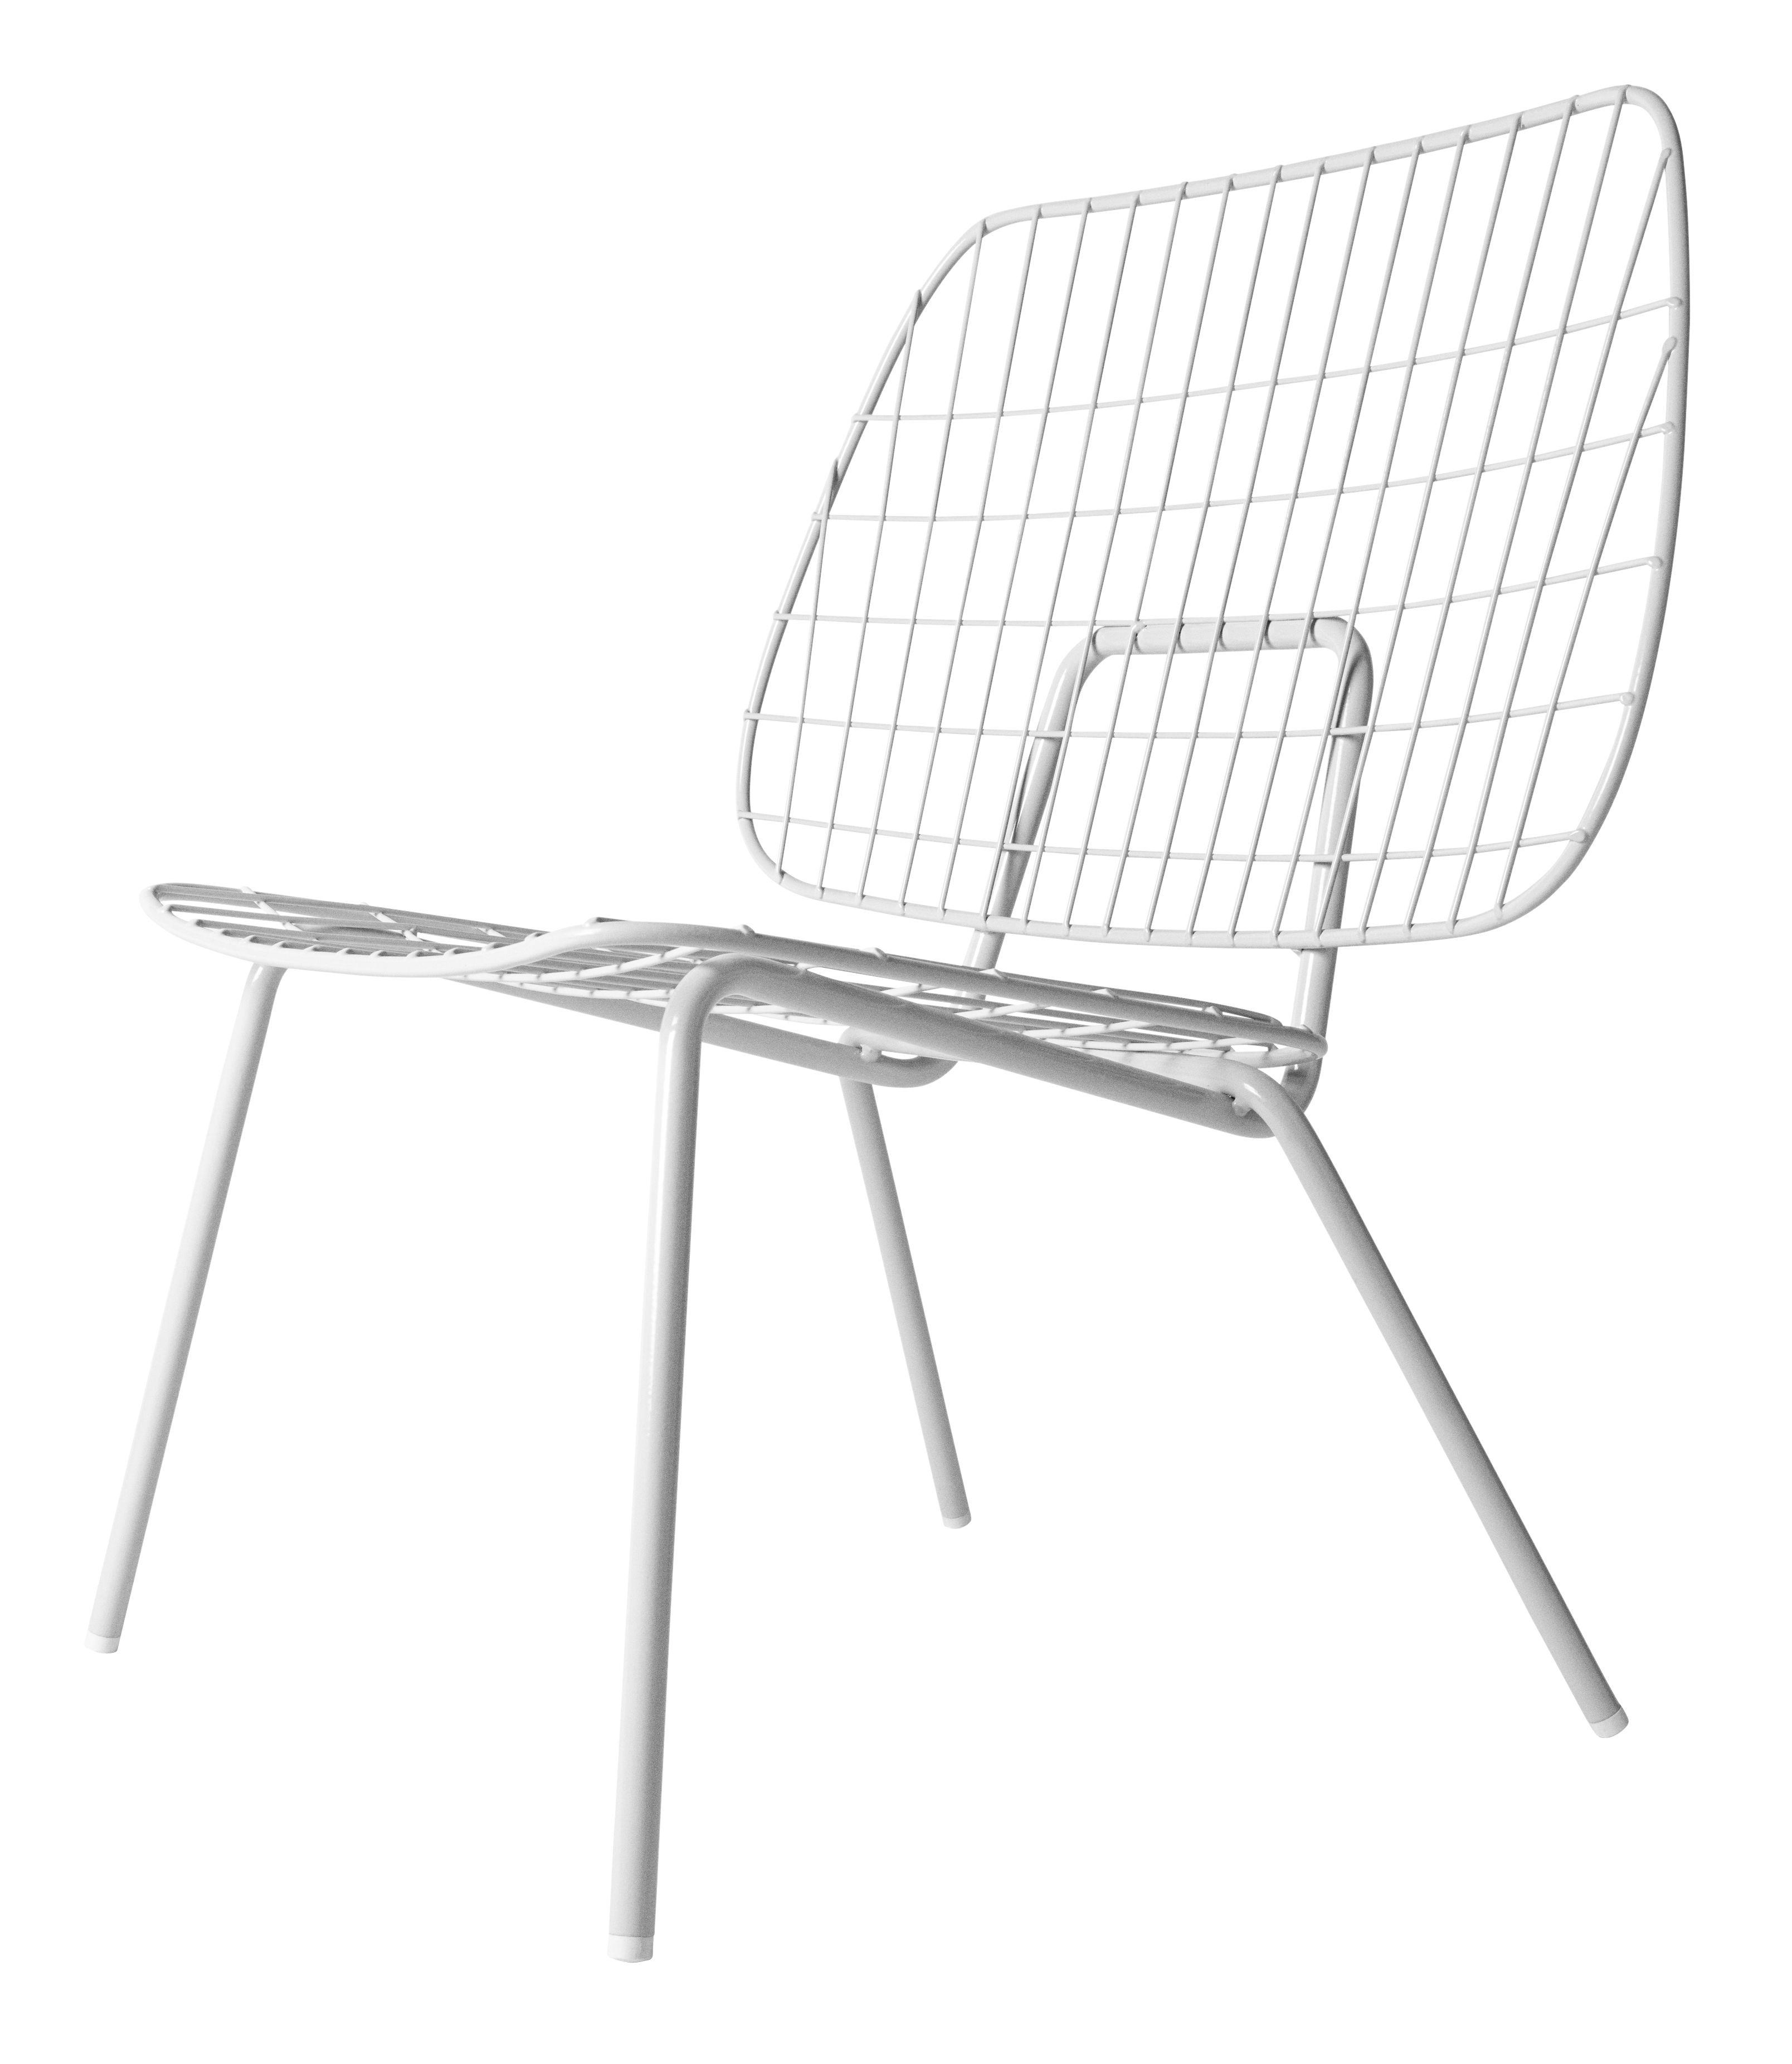 Fauteuil bas wm string lounge acier blanc menu for Alessi porte listino prezzi